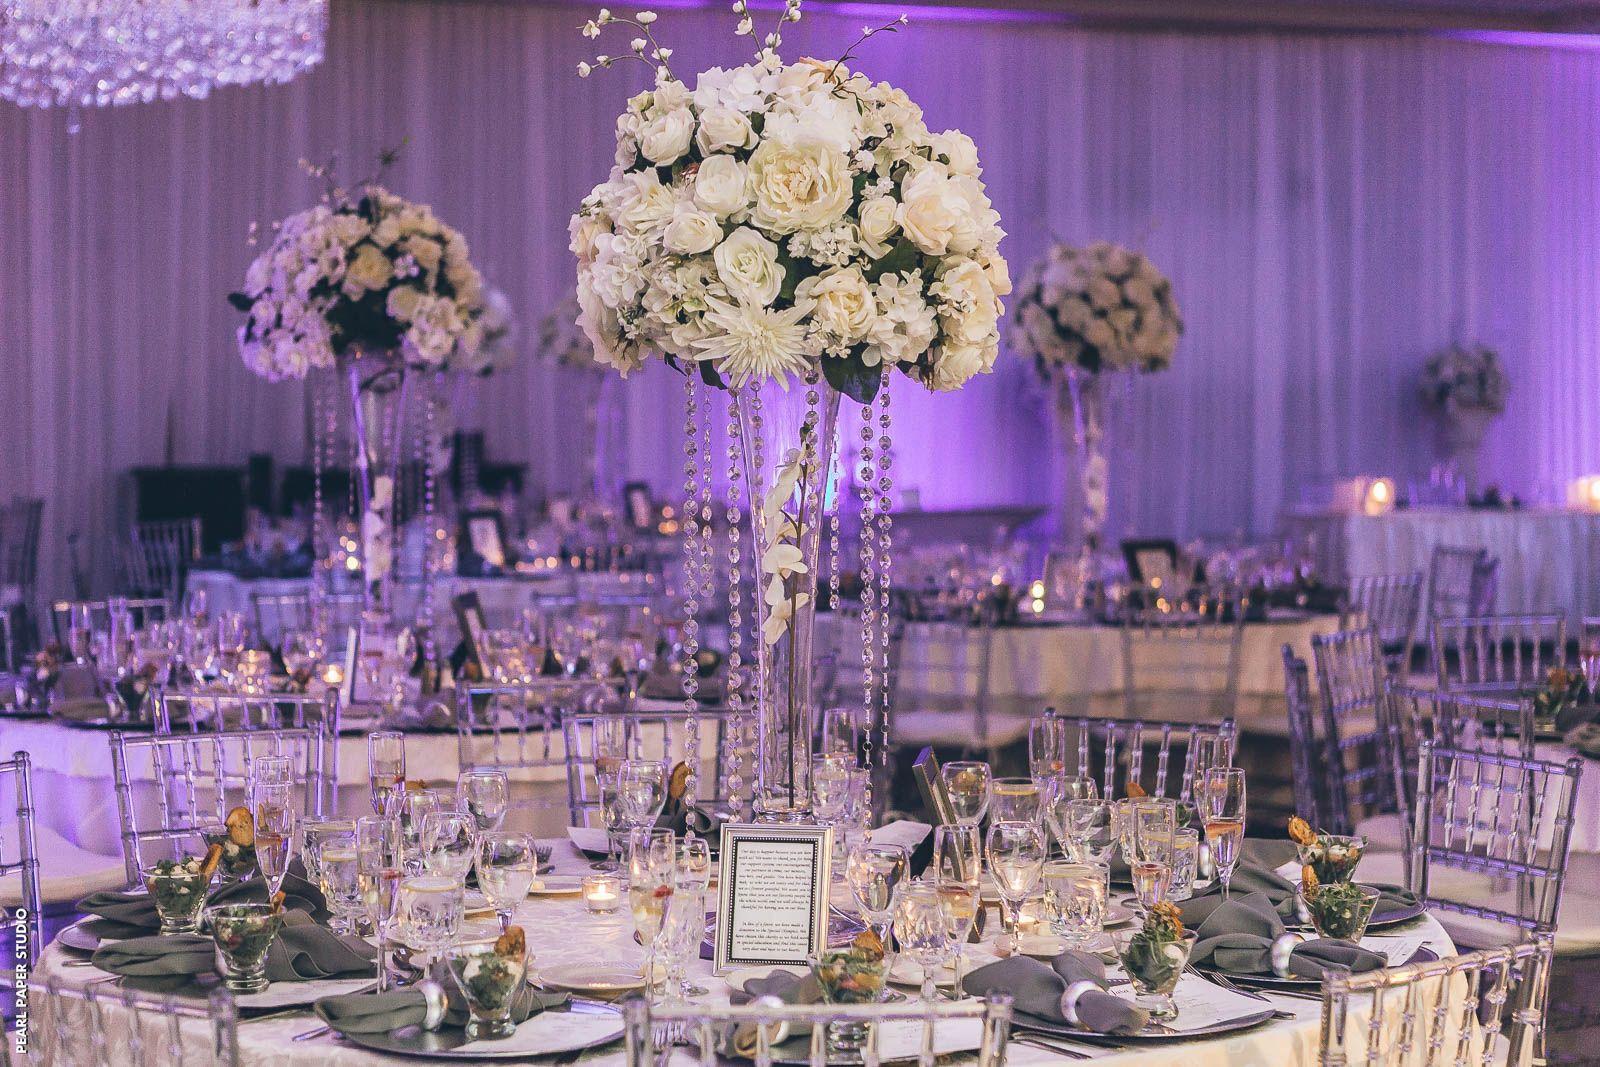 Crystal Ballroom weddings in Freehold, NJ